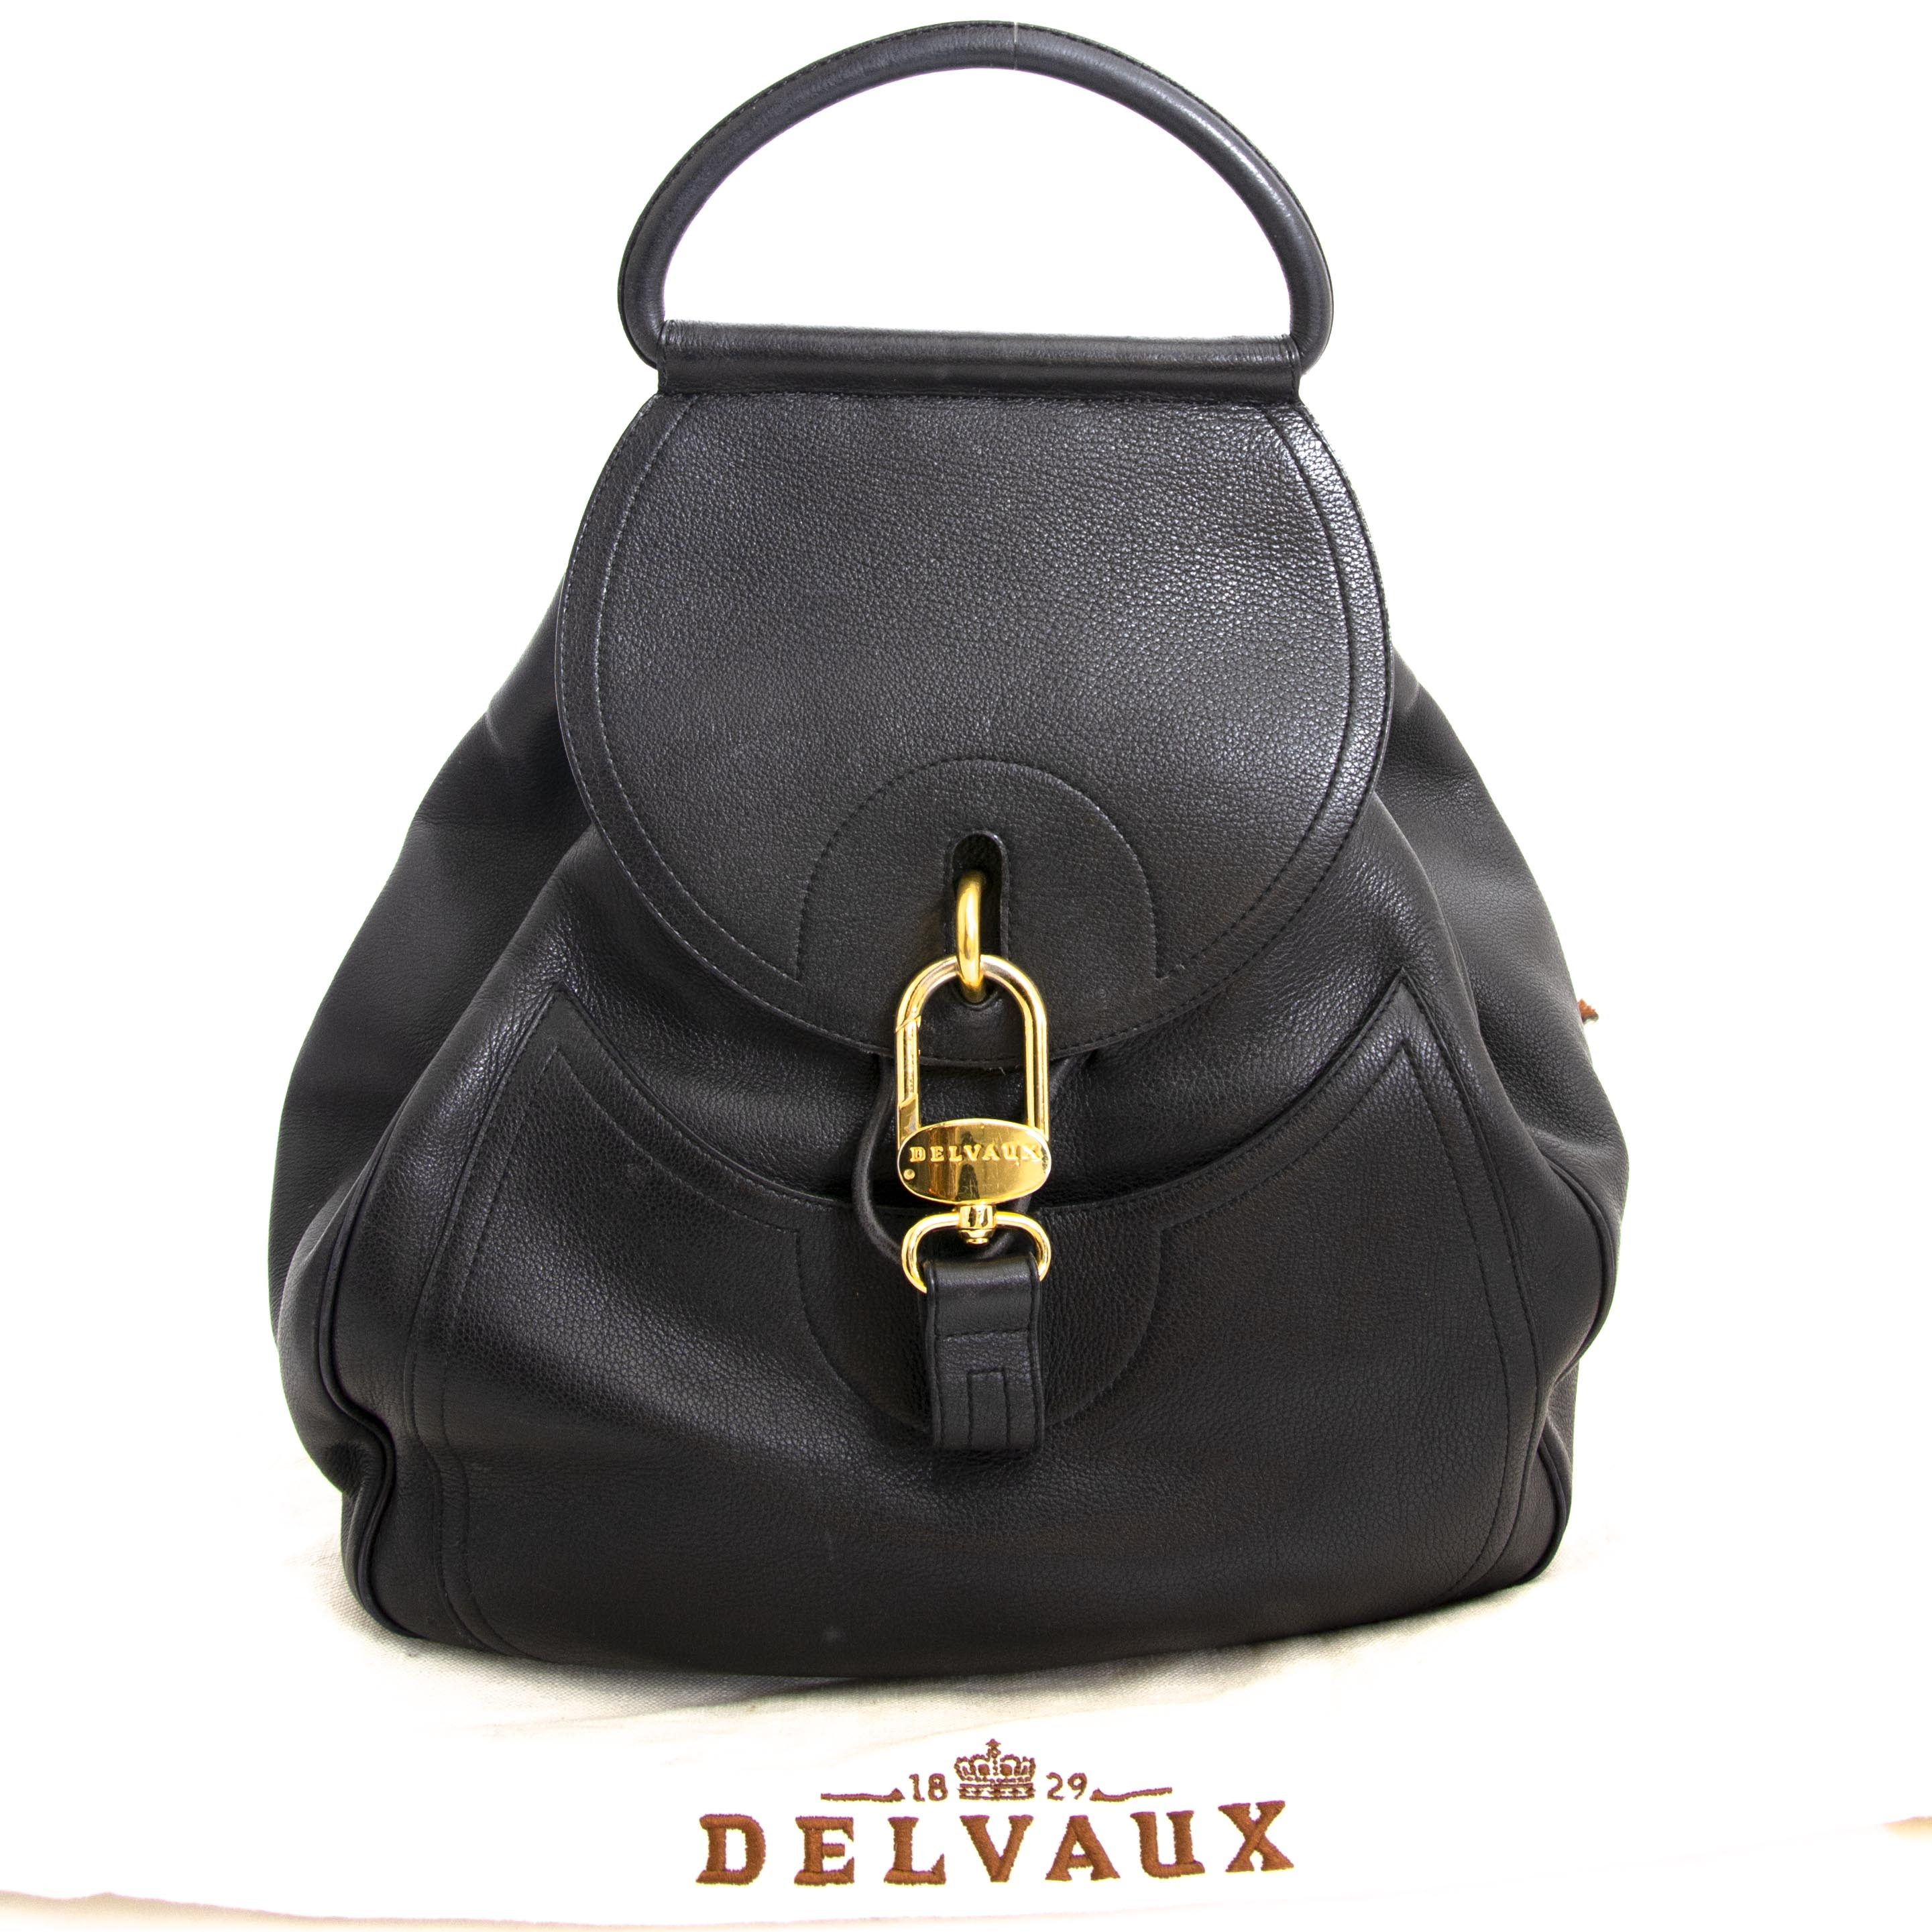 Travel handsfree in style wherever you go, with this all black Delvaux Leather Lucifer GM bag. veilig online aankopen tegen de beste prijs